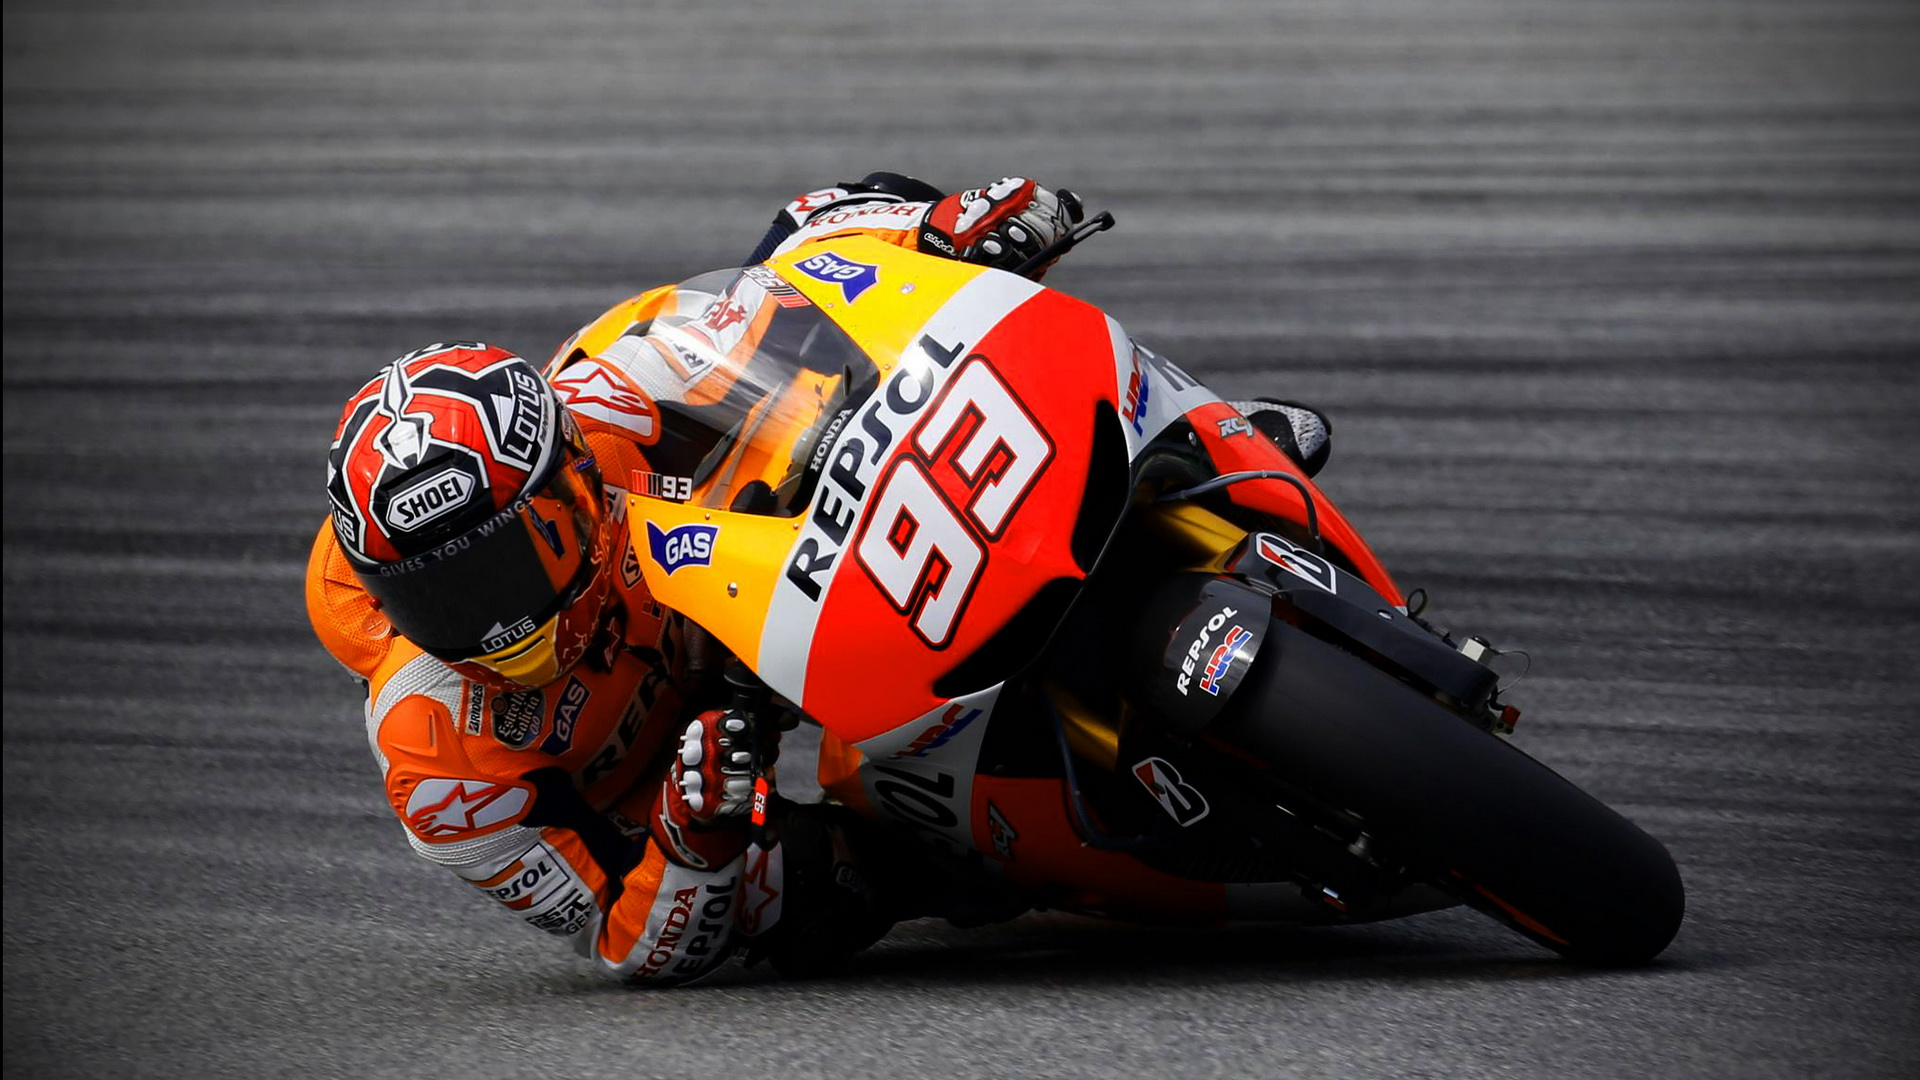 marc marquez motogp 2013 wallpaper MotoGP 1920x1080